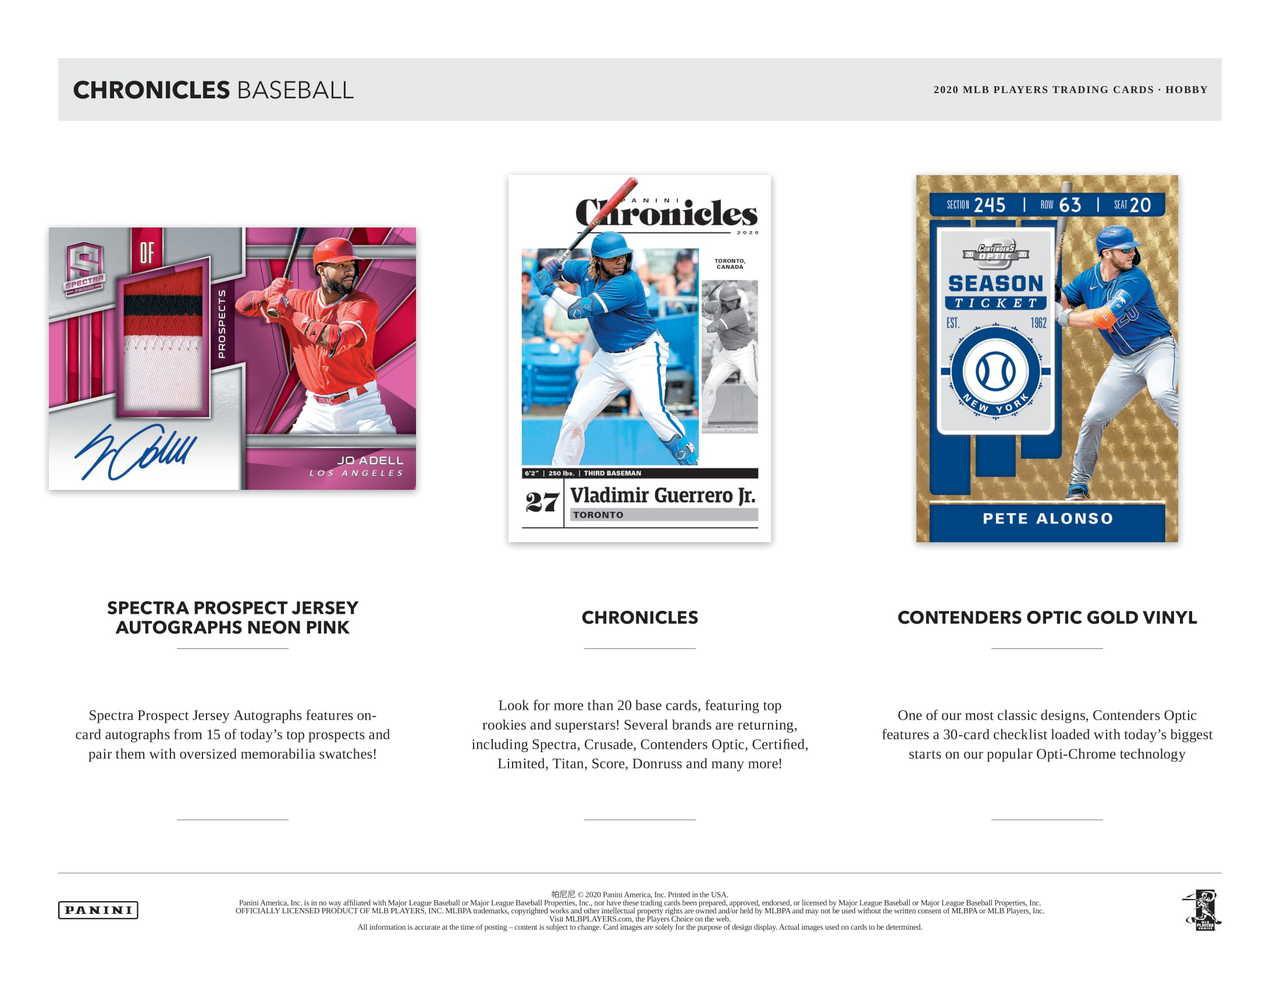 2020 Panini Chronicles Baseball Hobby 16 Box Case